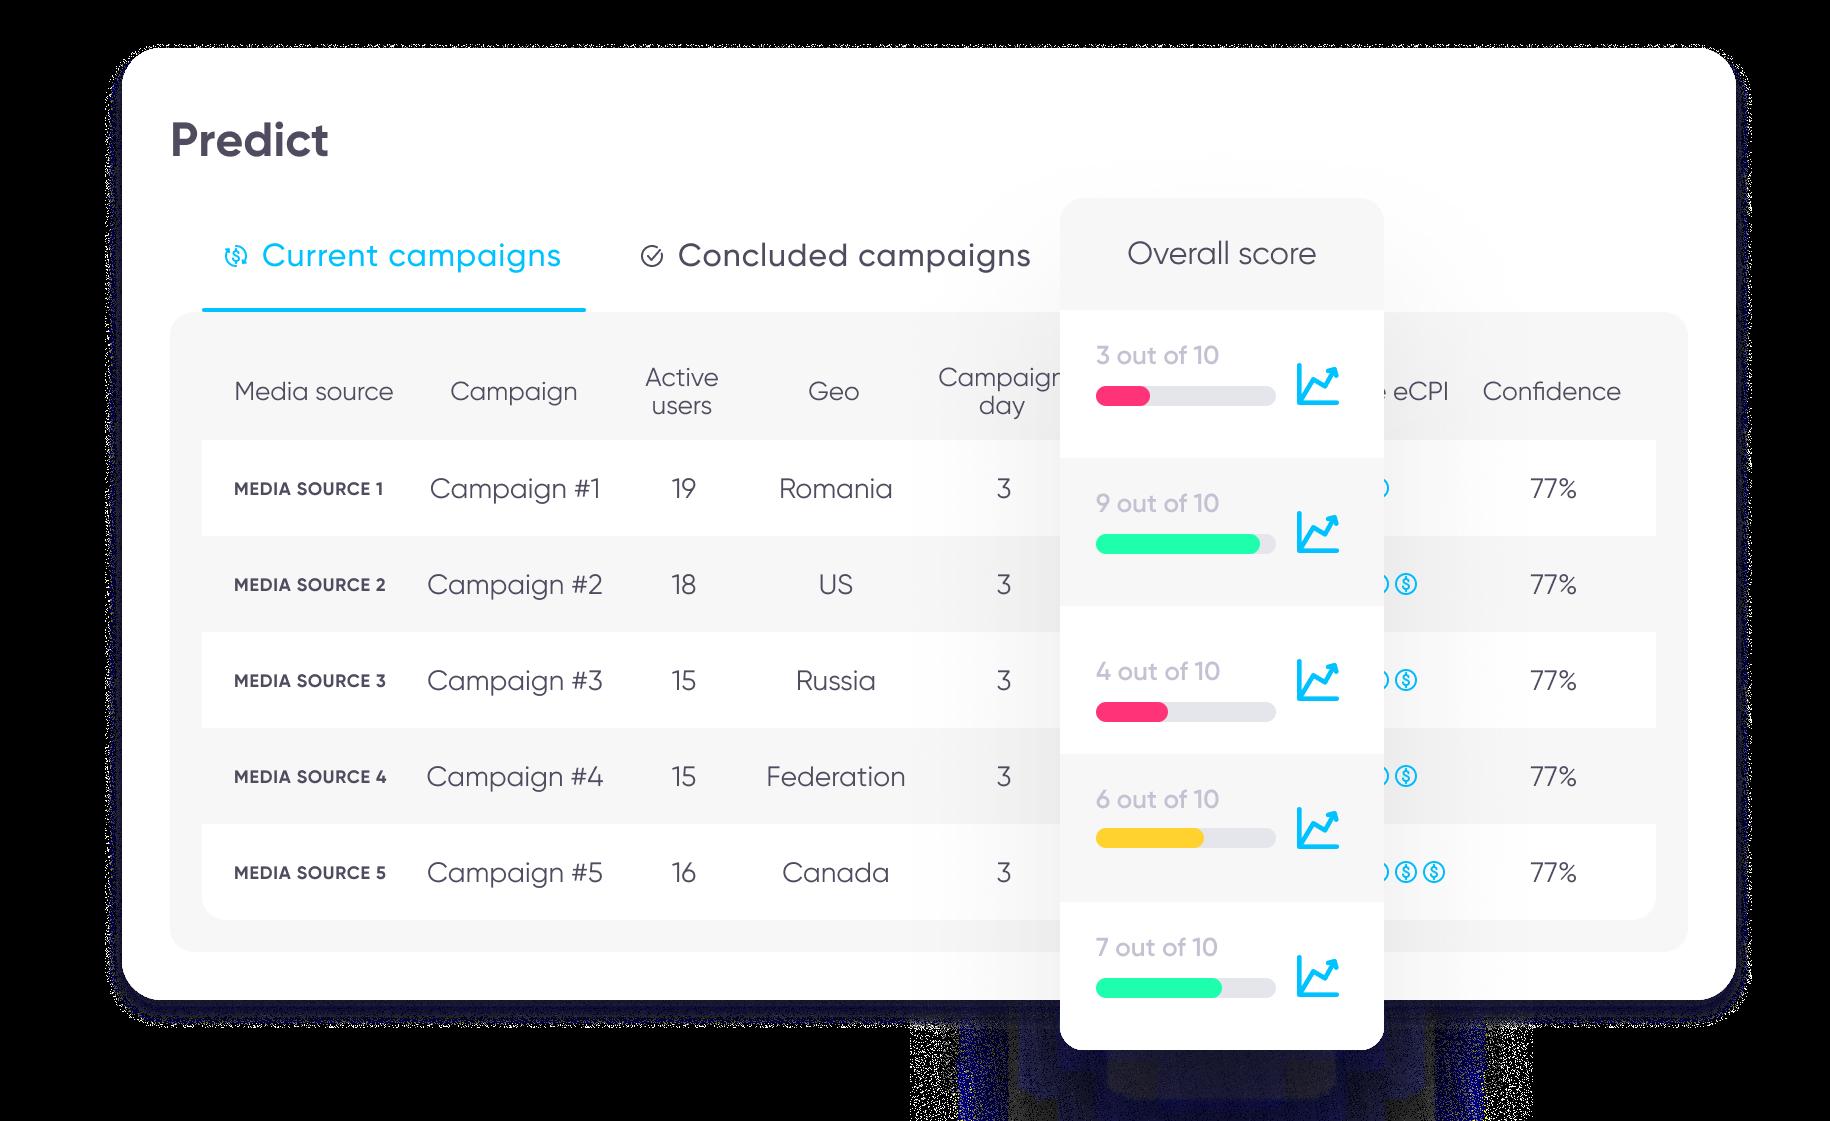 AppsFlyer PredictSK dashboard